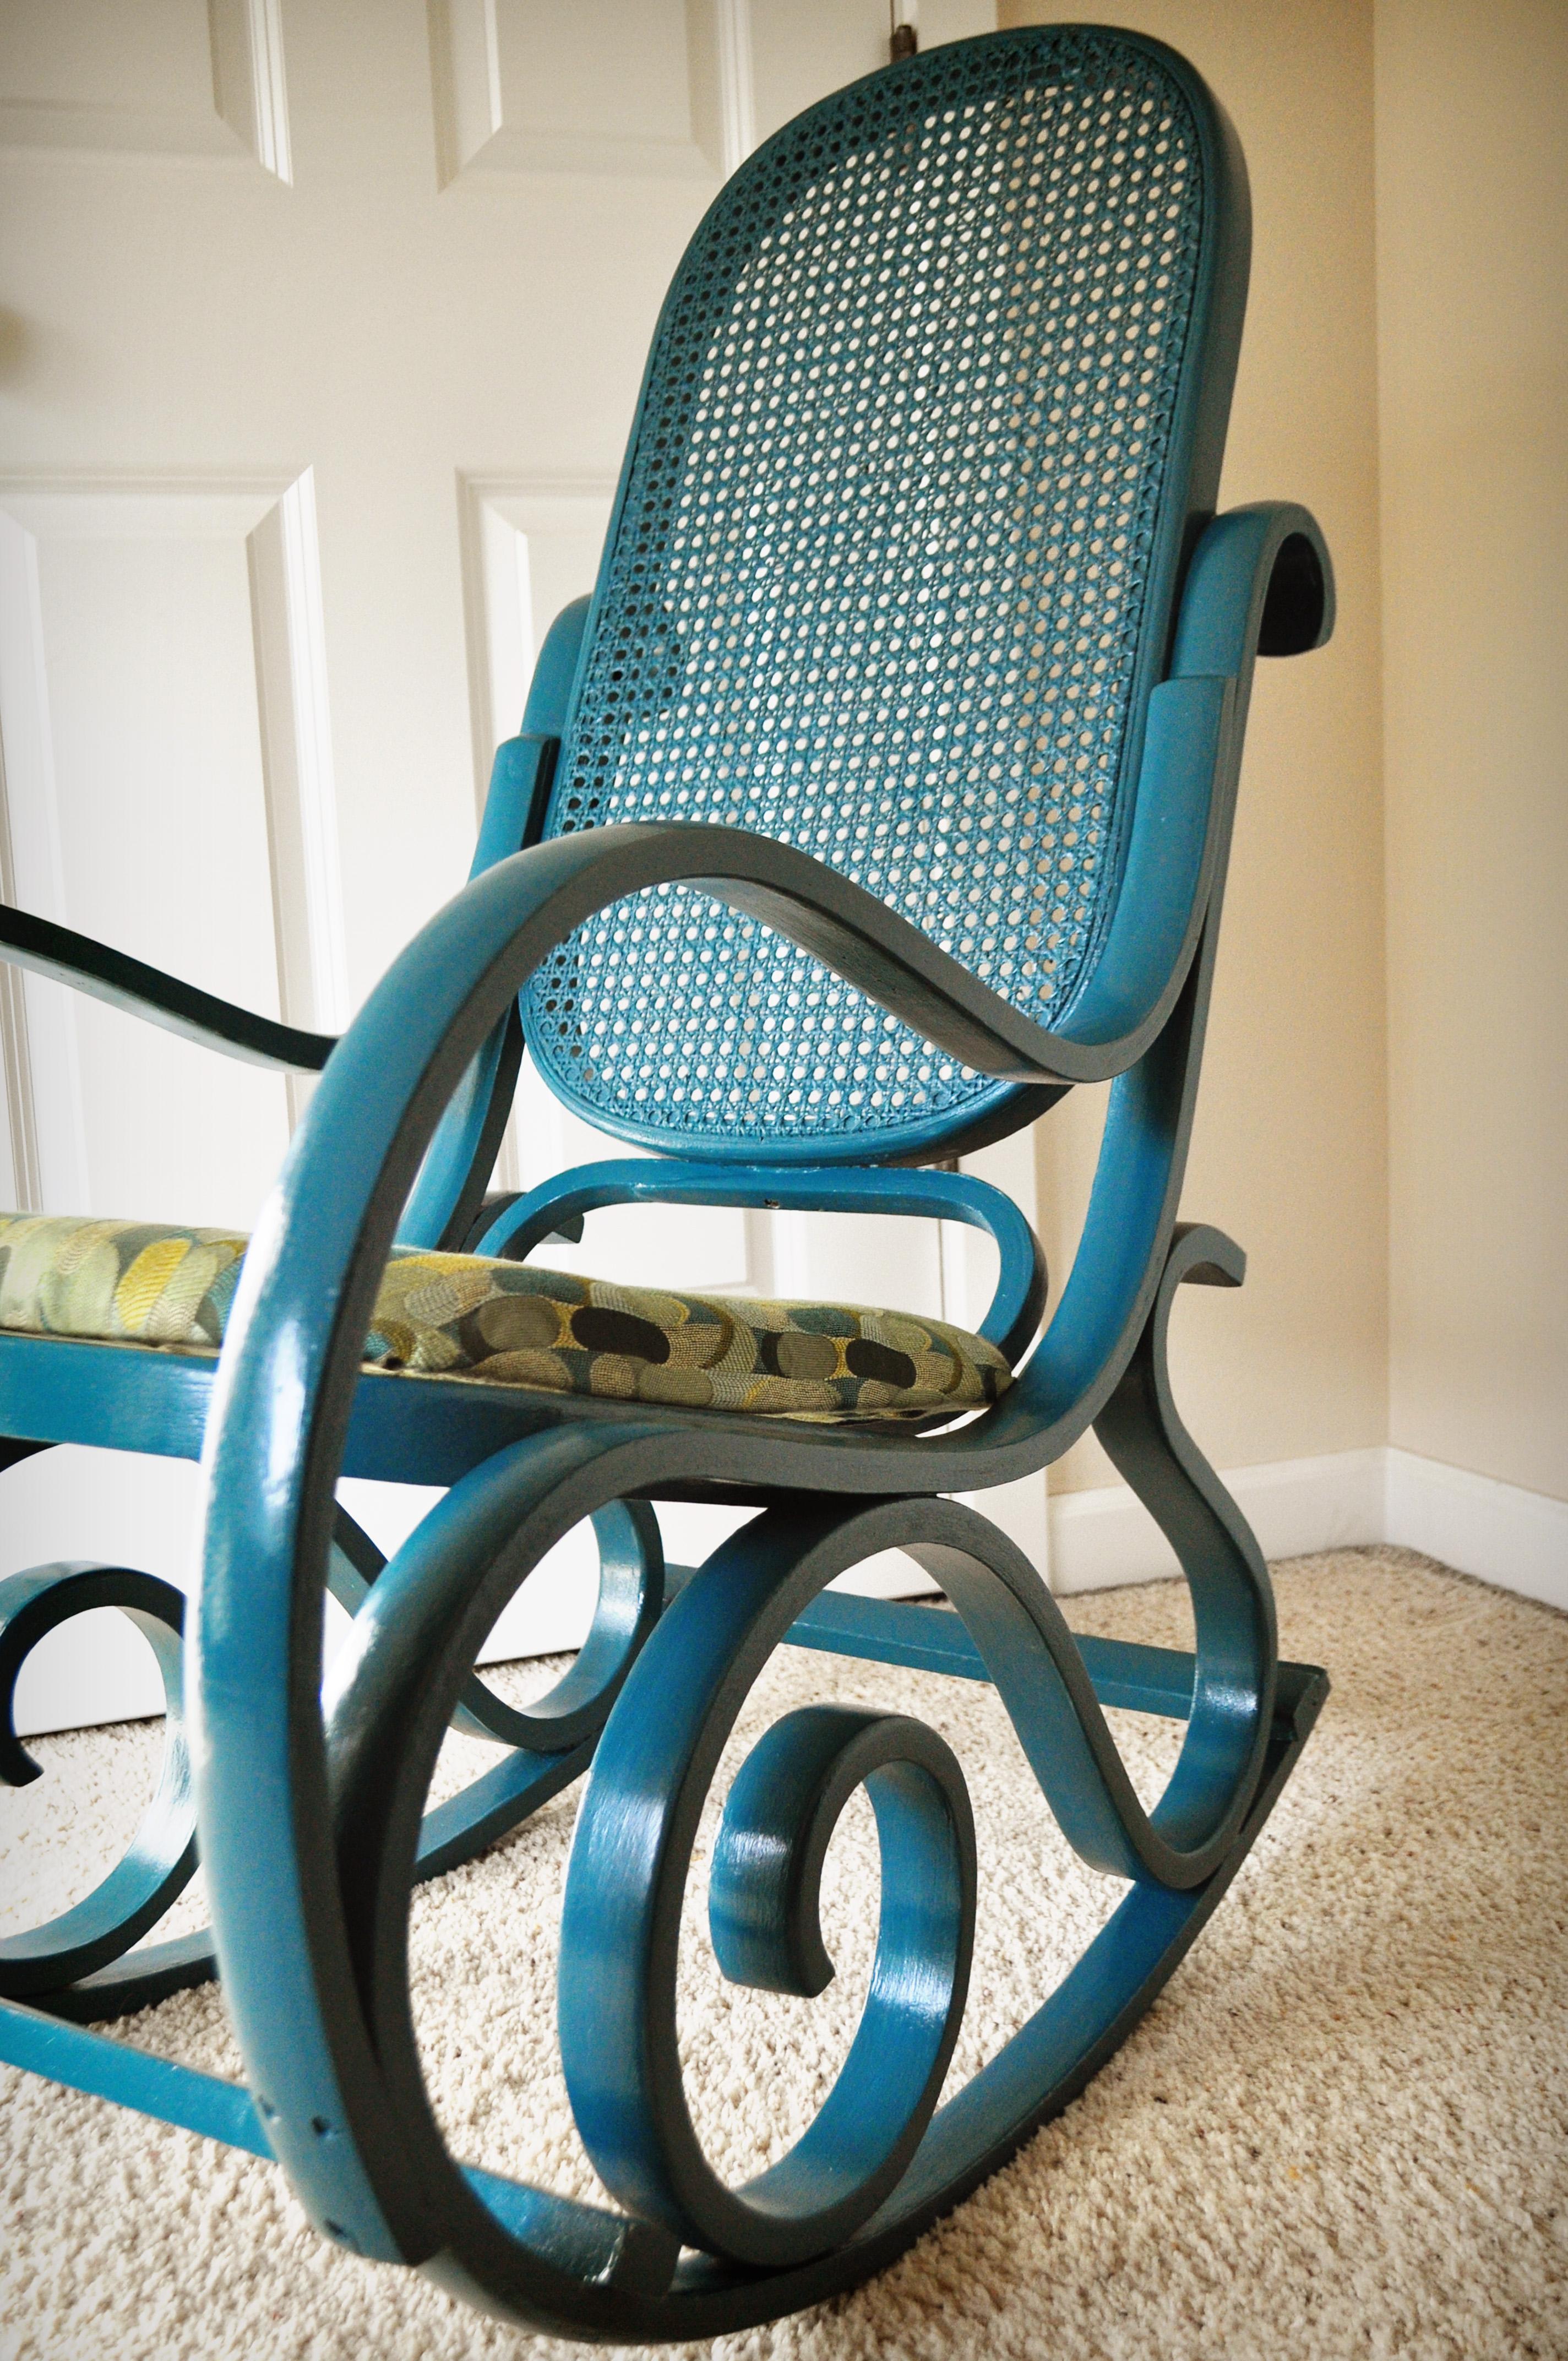 wicker rocking chair rocker recliner for nursery completedwood and rattan diy newbies